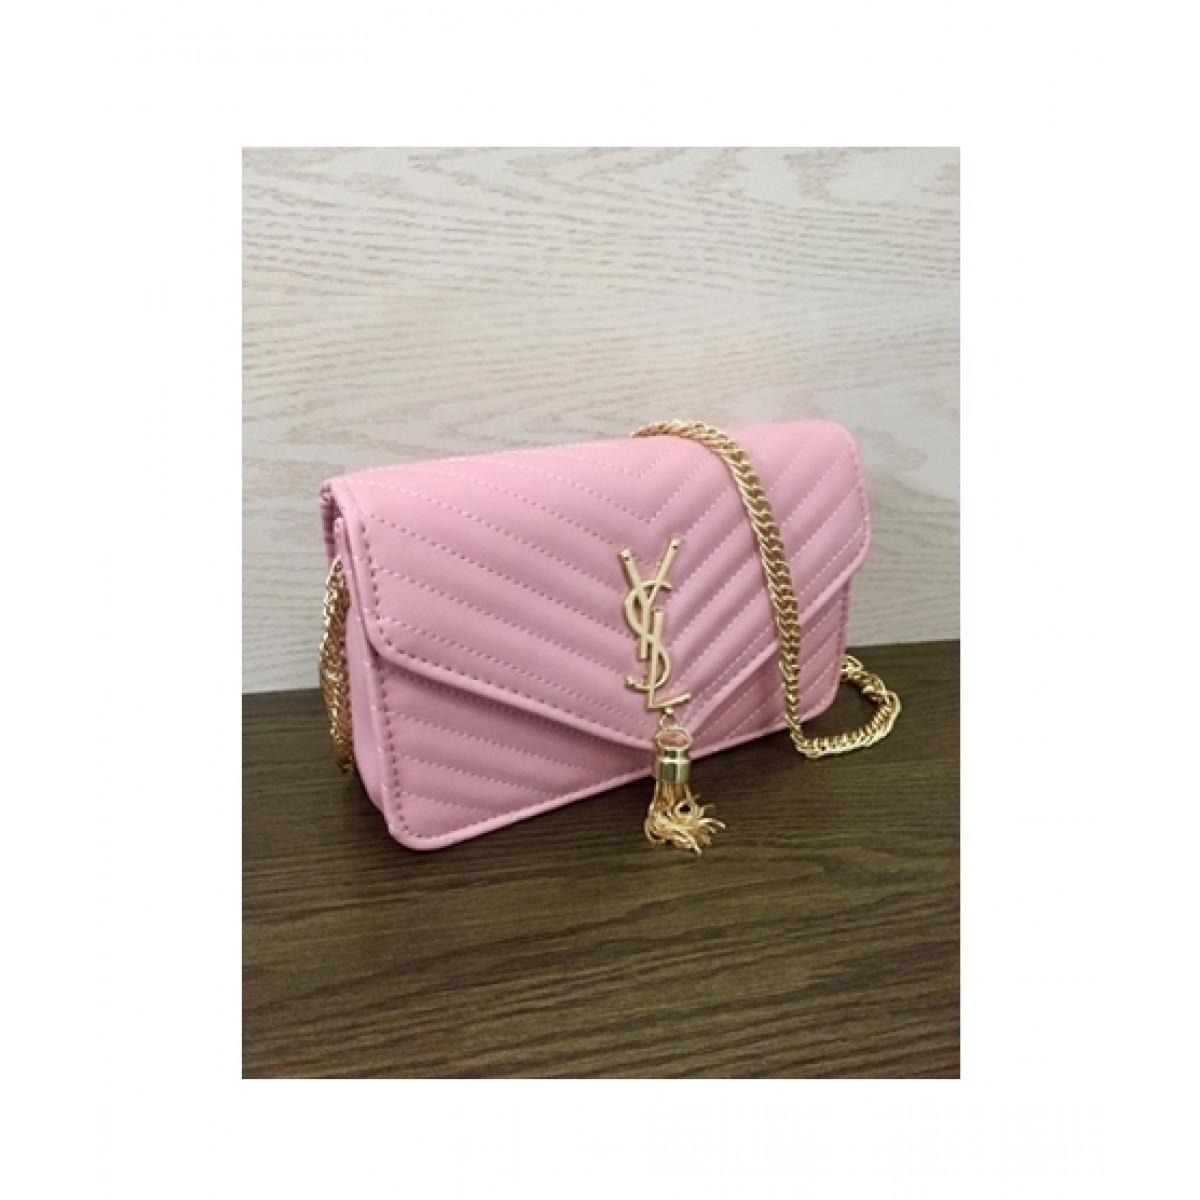 HM Cross Body Bag For Women Pink (0017)